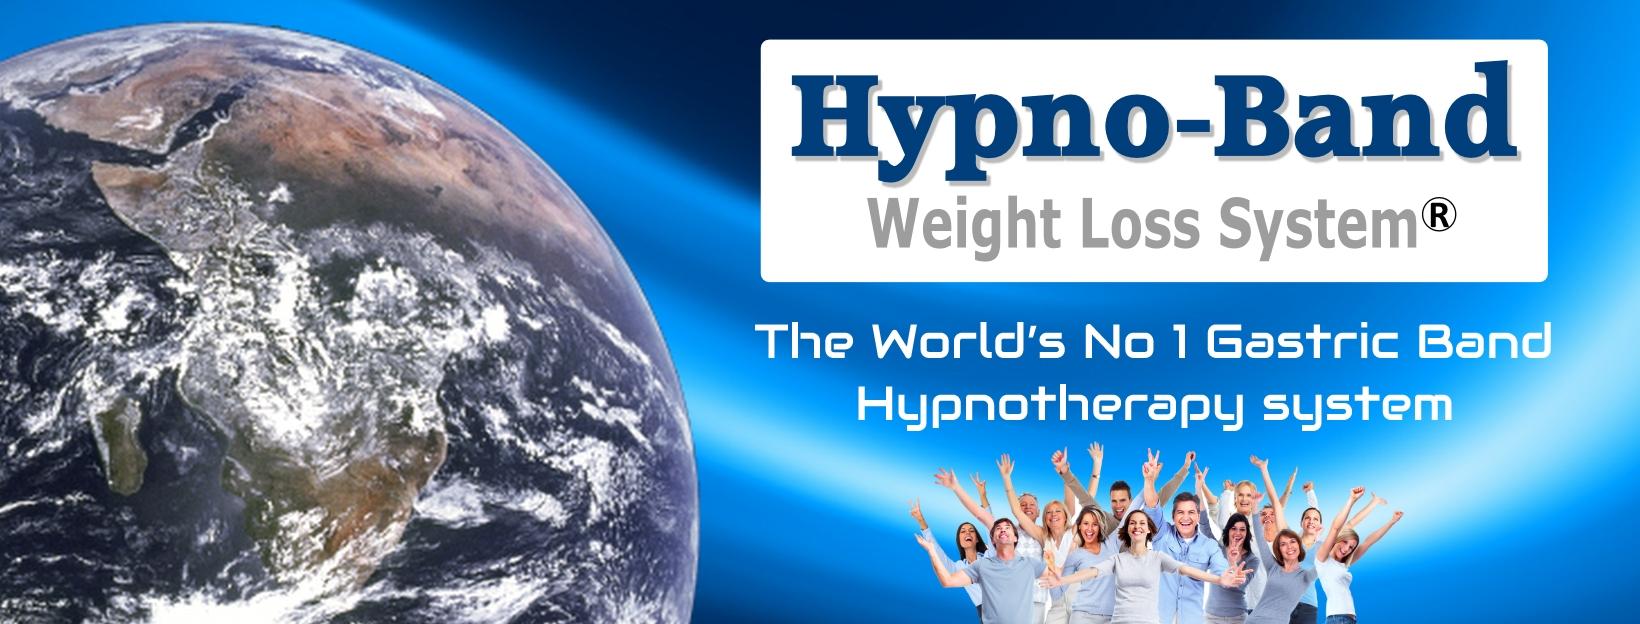 hypnoband facebook banner image